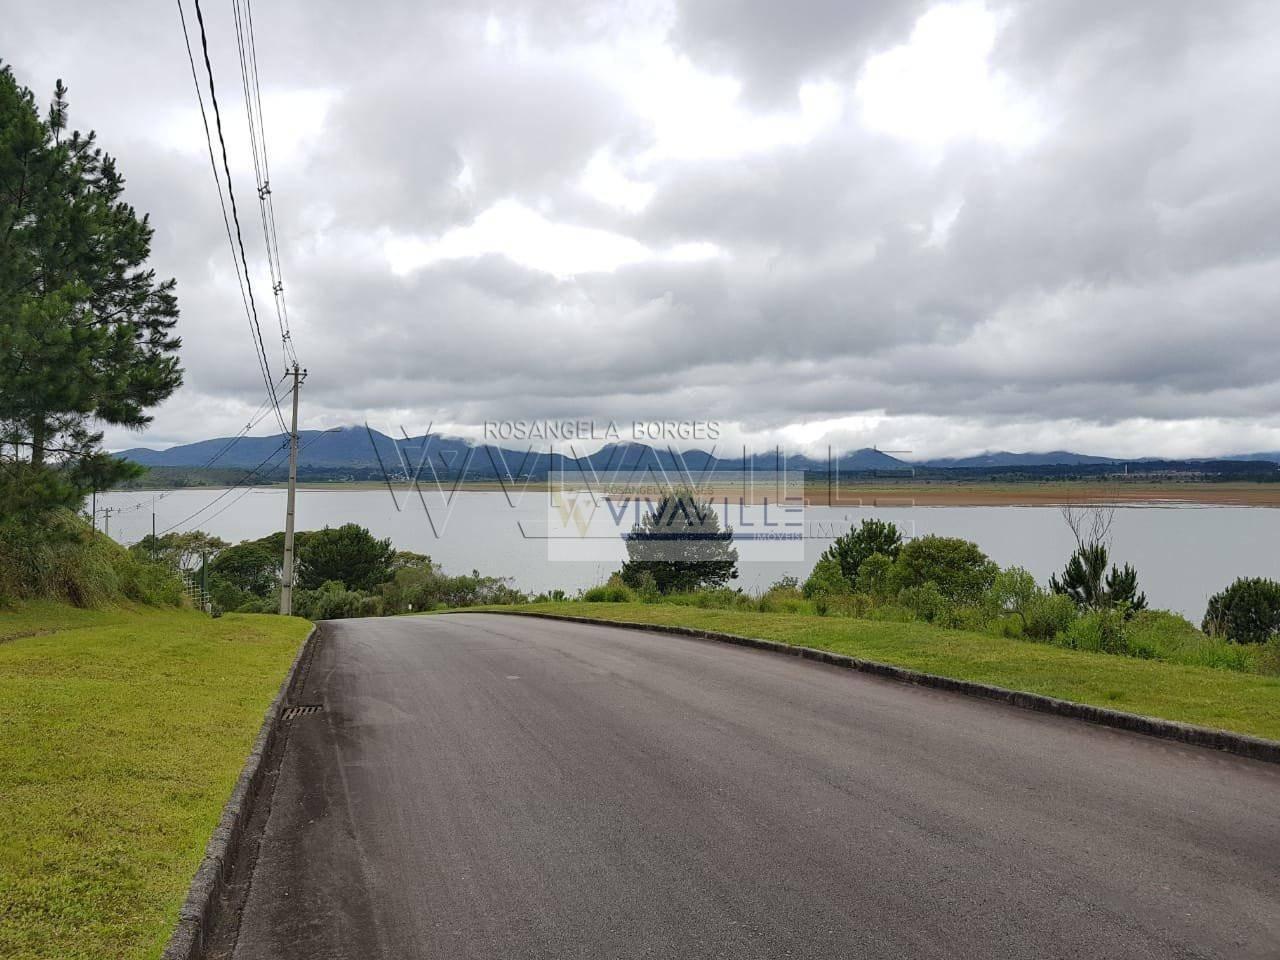 Terreno à venda, por R$ 750.000 - Menino Deus - Quatro Barras/PR